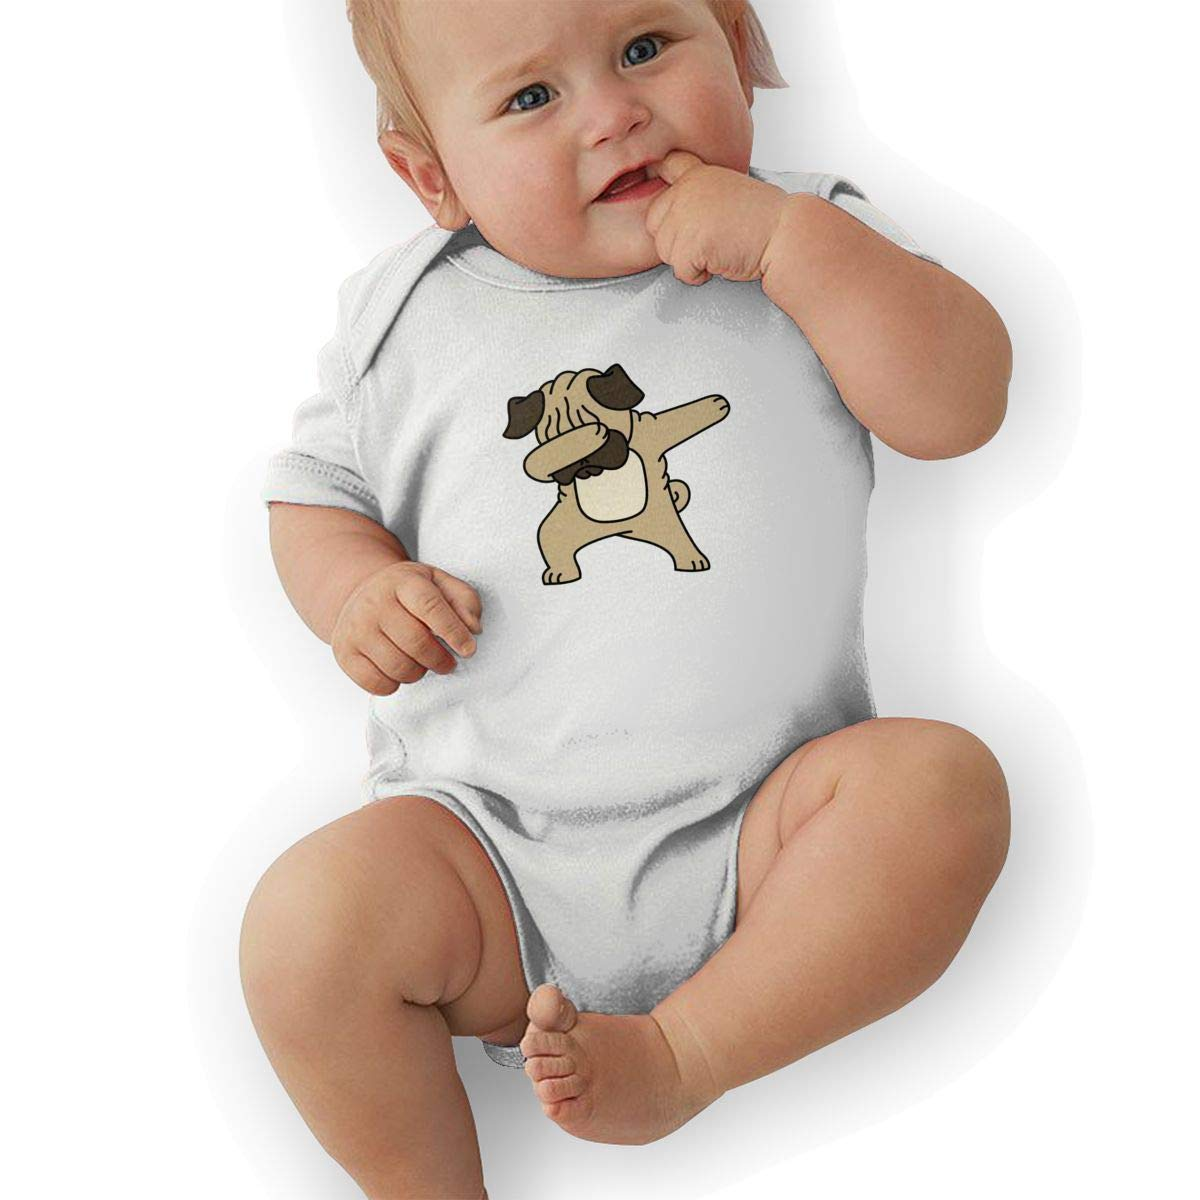 BONLOR Cute Dabbing Dog Baby Boys Girls Jumpsuits Short Sleeve Romper Bodysuit Bodysuit Jumpsuit Outfits White